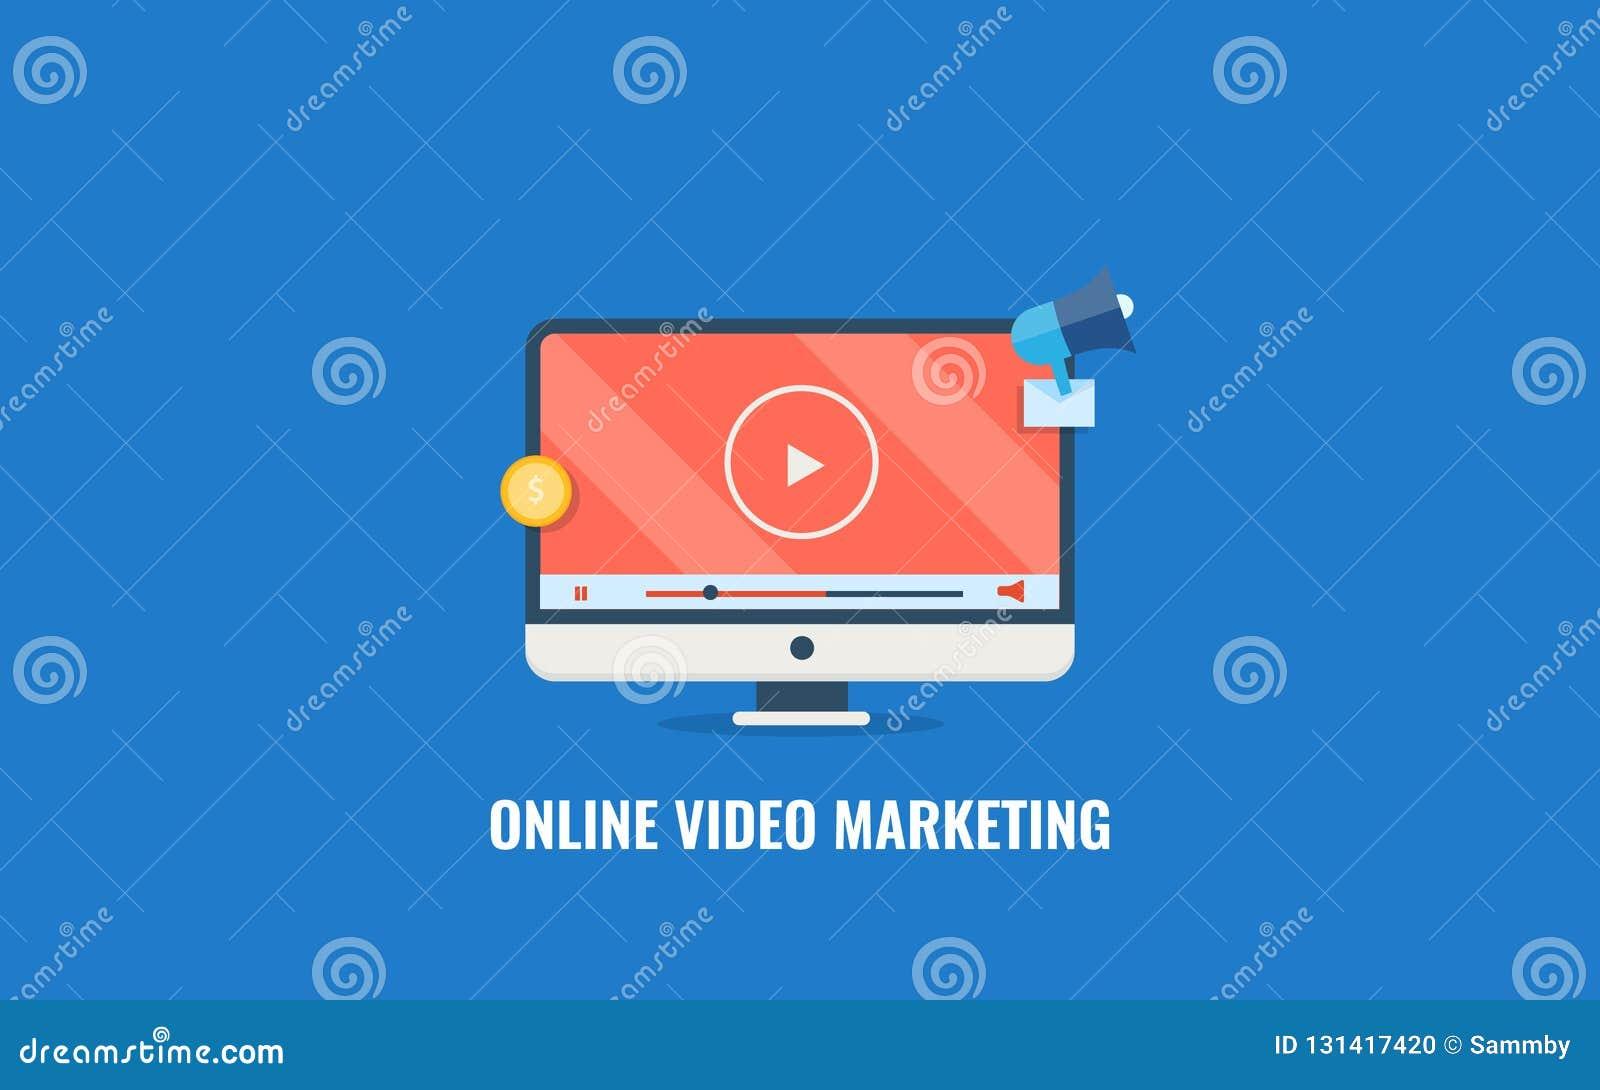 Online video marketing, digital content promotion, audience engagement, social media promotion. Flat design vector banner.